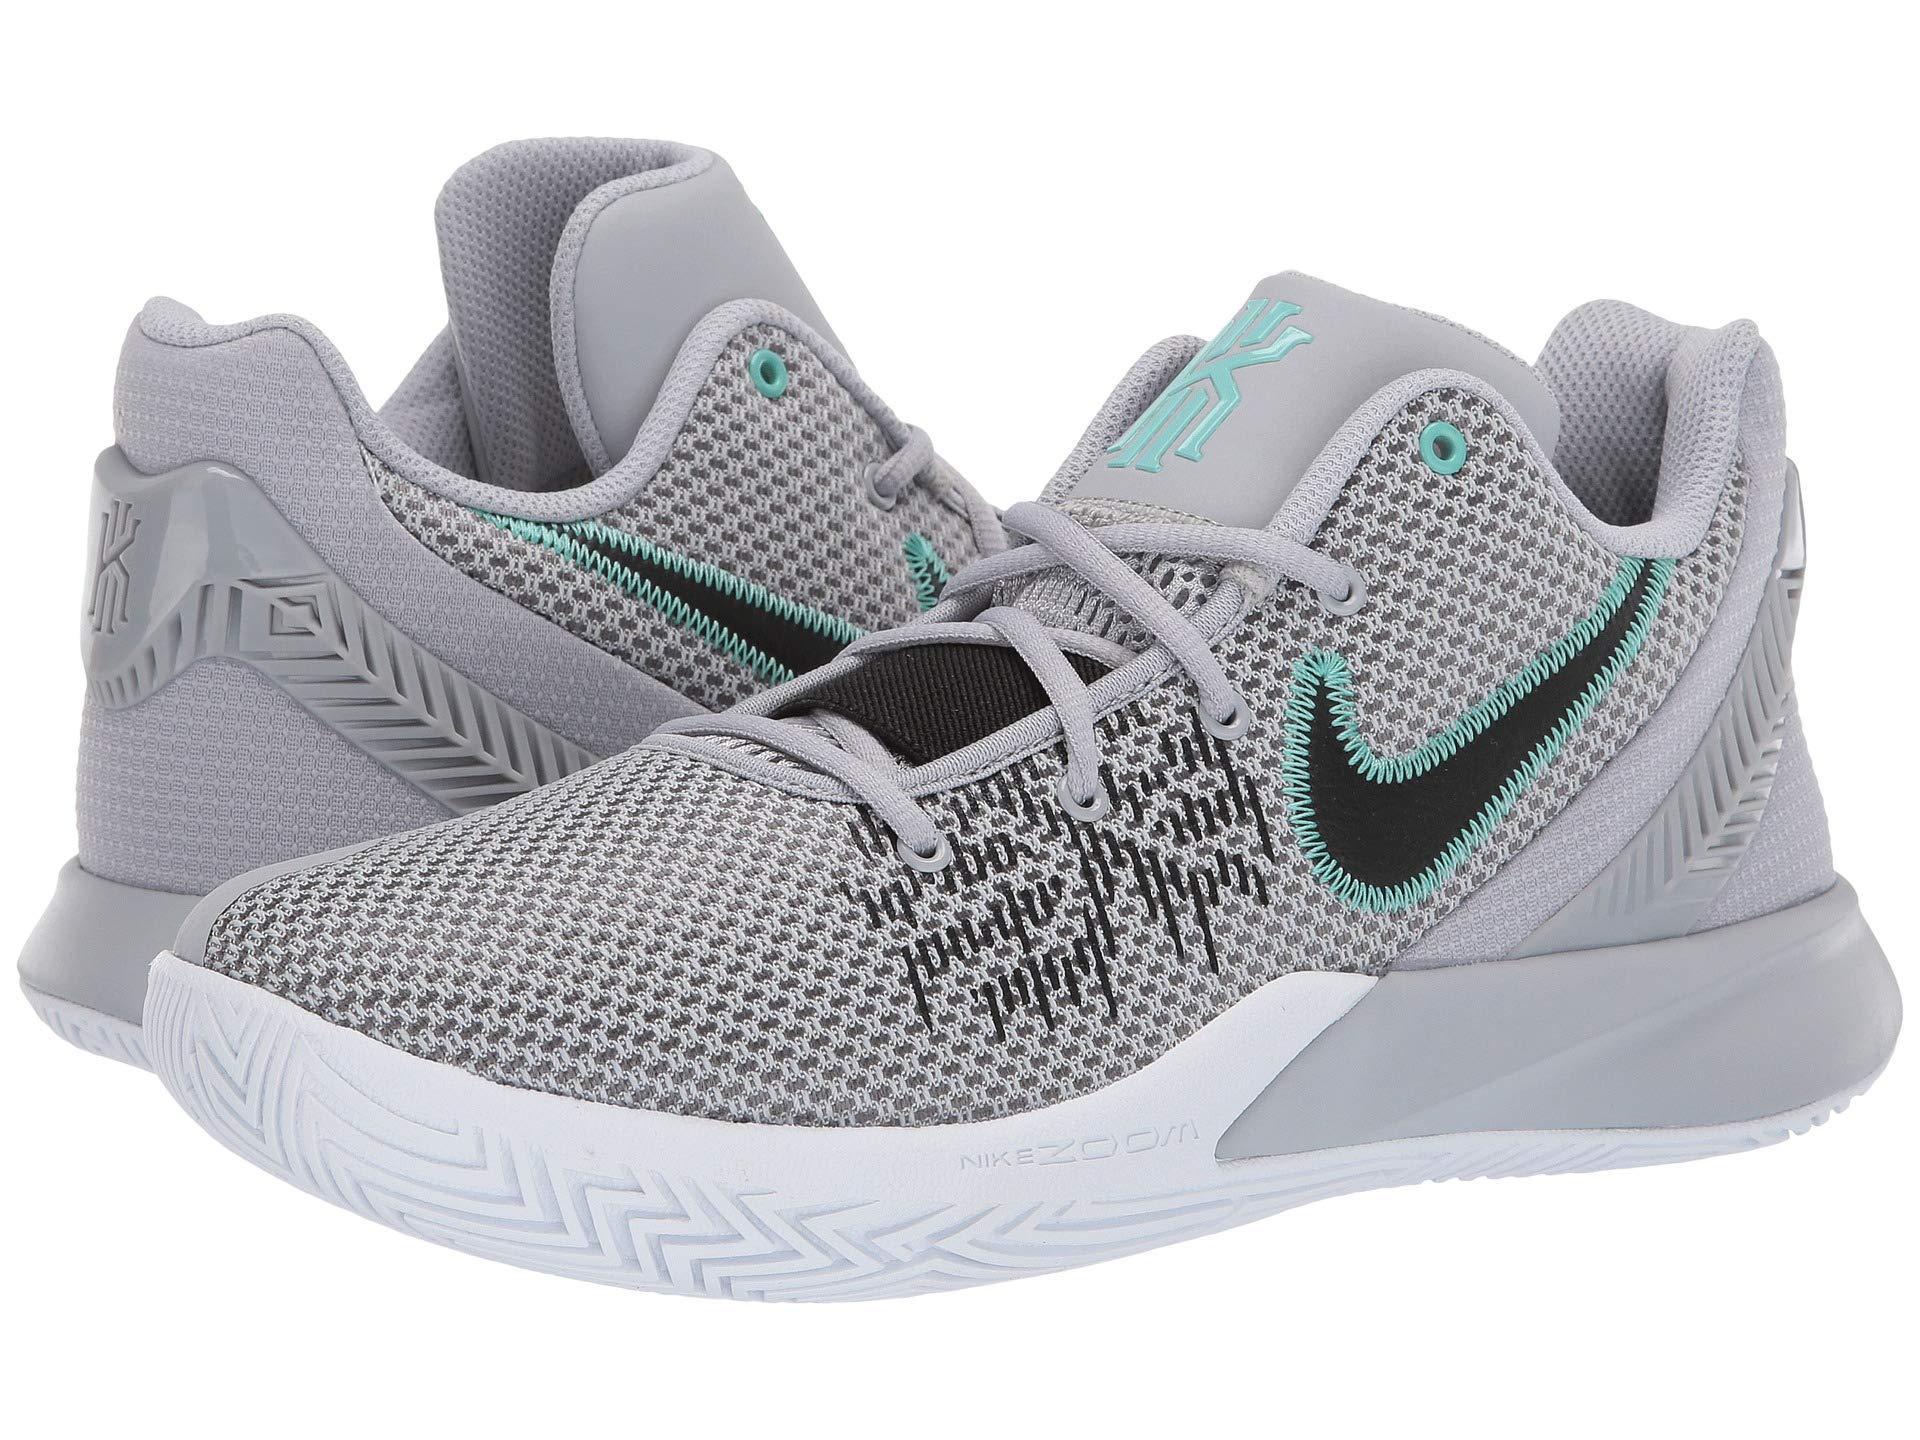 e232f5fb610b Nike Kyrie Flytrap Ii (black black white) Men s Basketball Shoes in ...